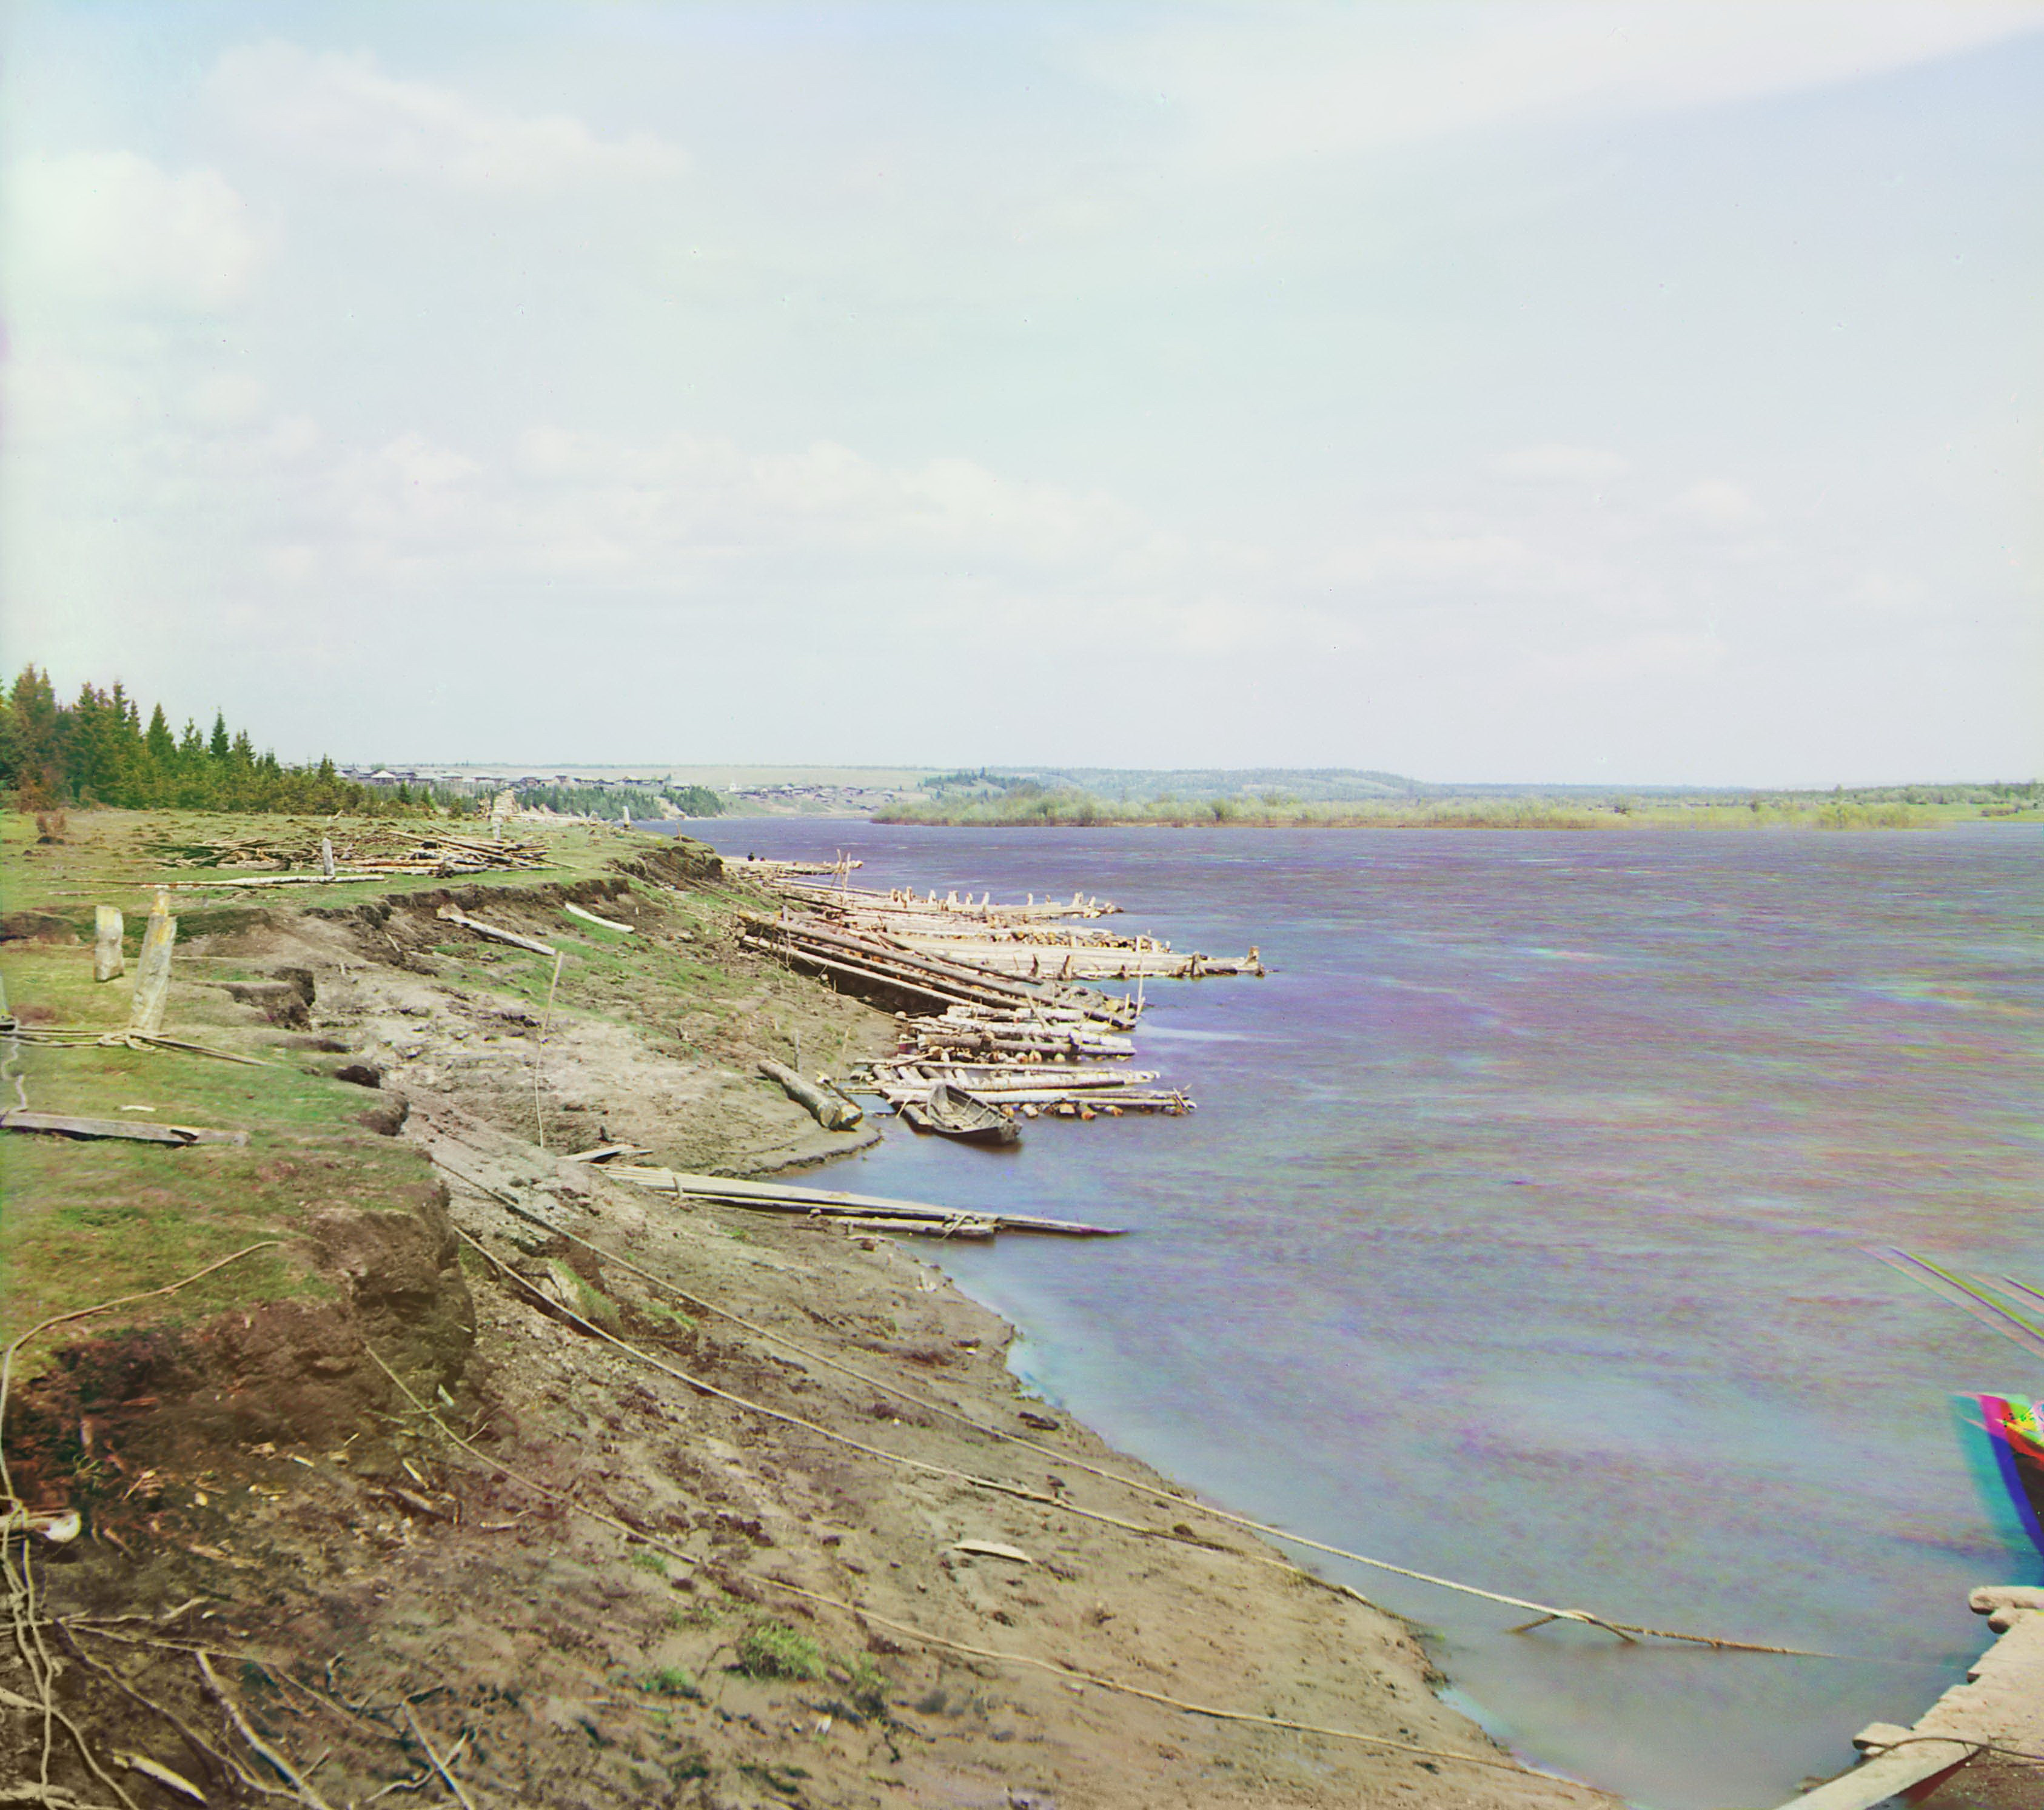 Окрестности села. Река Колва от земского перевоза по пути от Чердыни к селу Ныроб